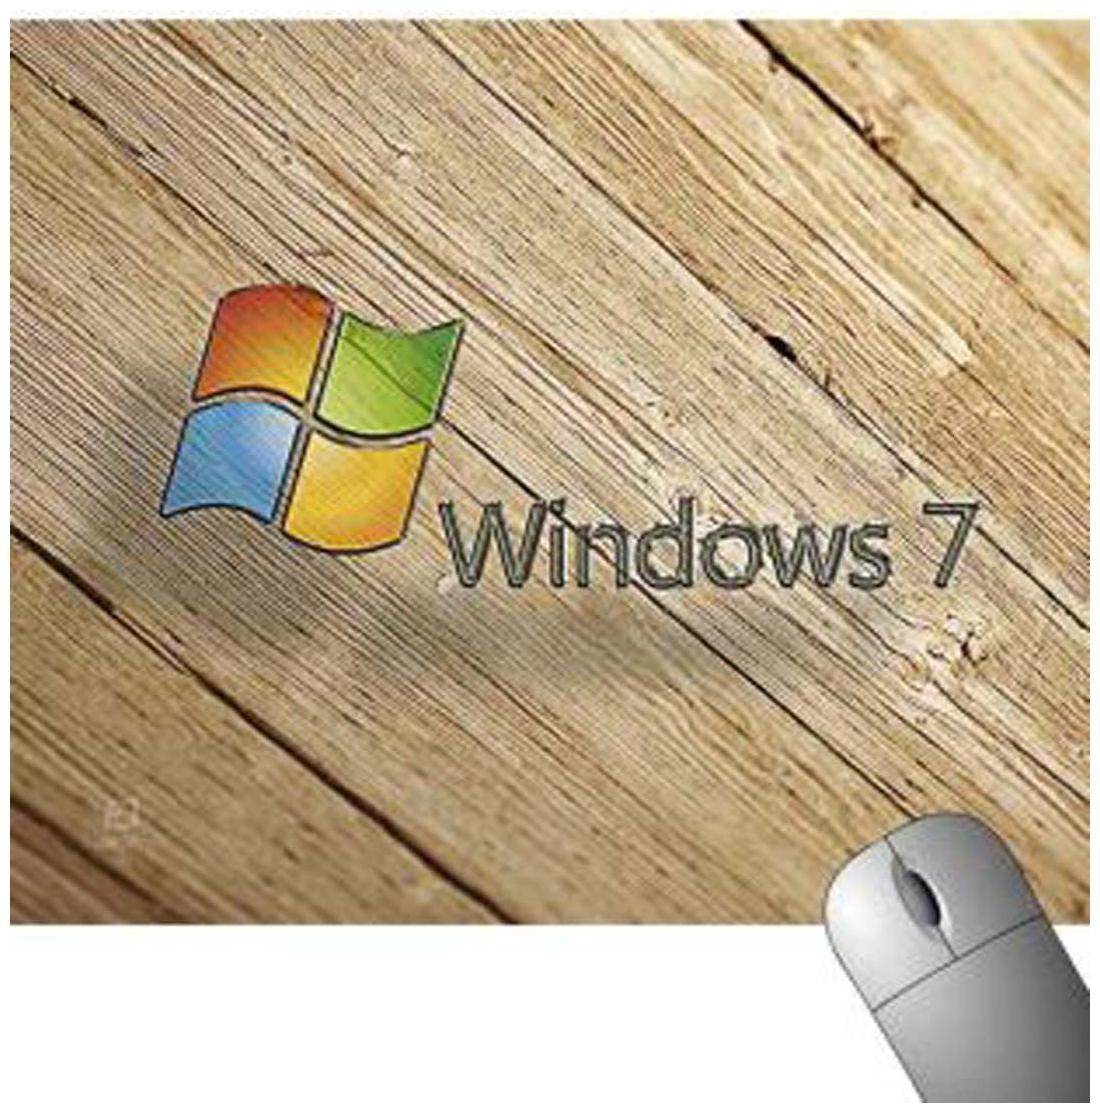 https://assetscdn1.paytm.com/images/catalog/product/G/GA/GAMFINEARTS-WINFINE30079F691A0C3/1563522789411_0.jpg